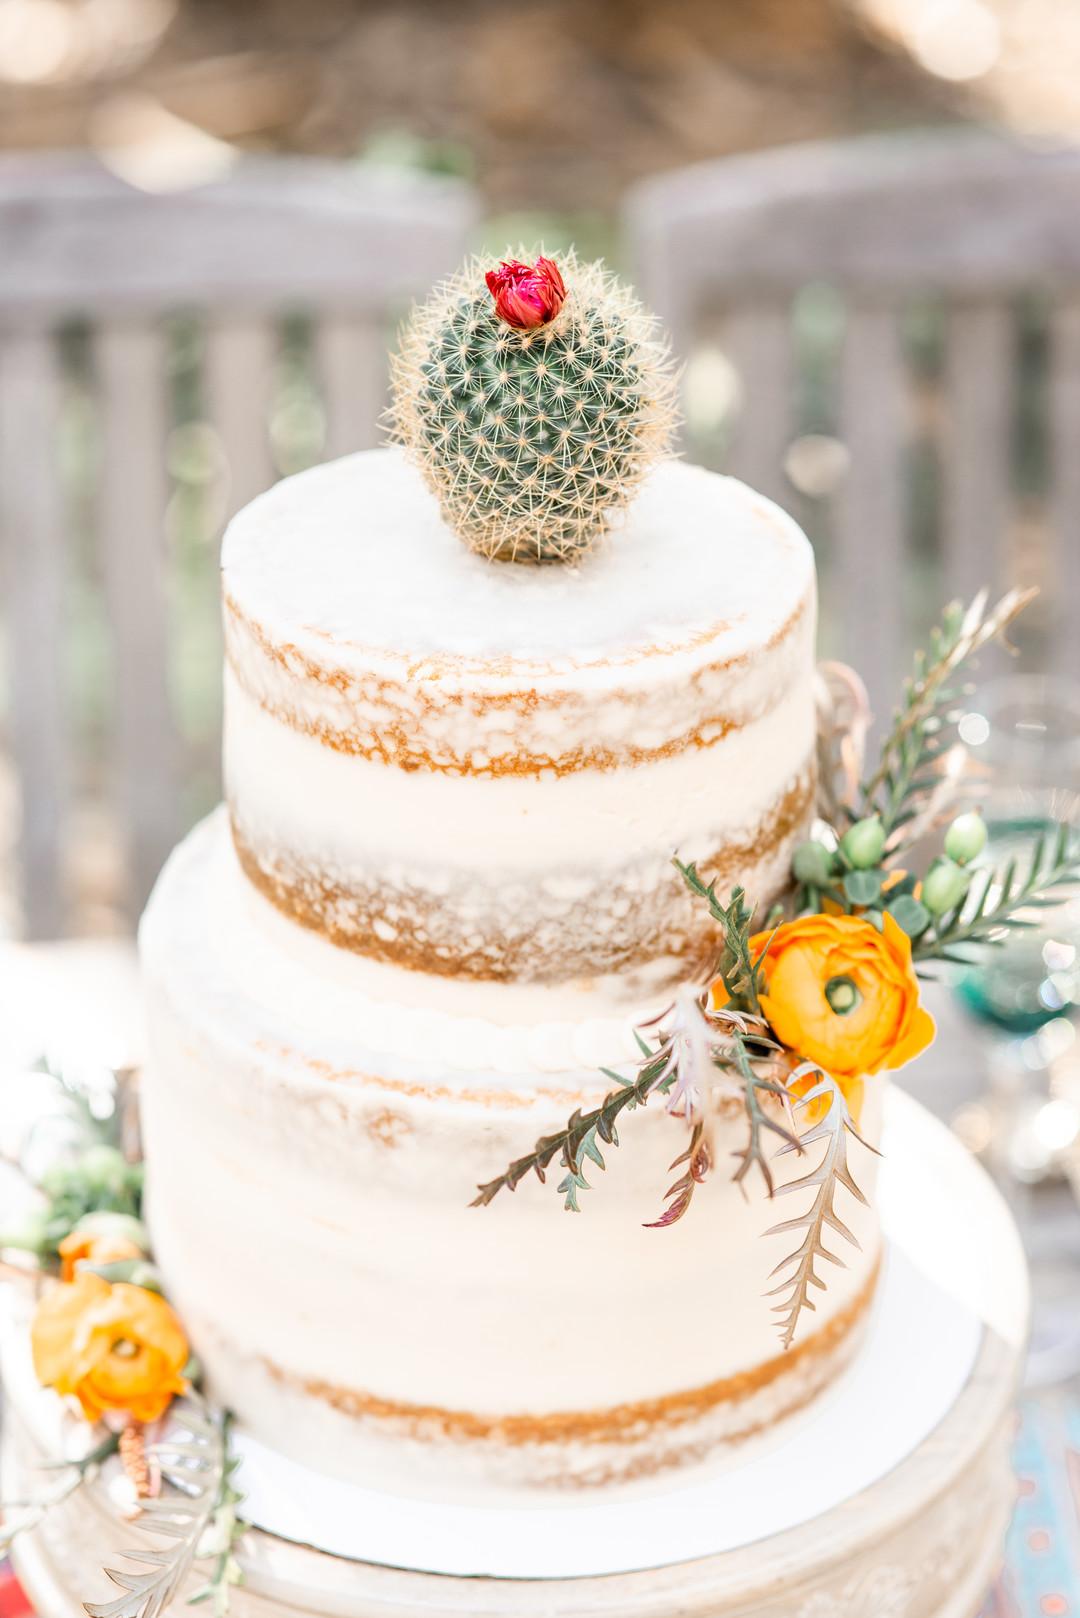 www.santabarbarawedding.com   Staci and Michael Photography   Montana de Oro State Park   EverAfter Wood Floral   Bri's Sweet Treats   Wedding cake